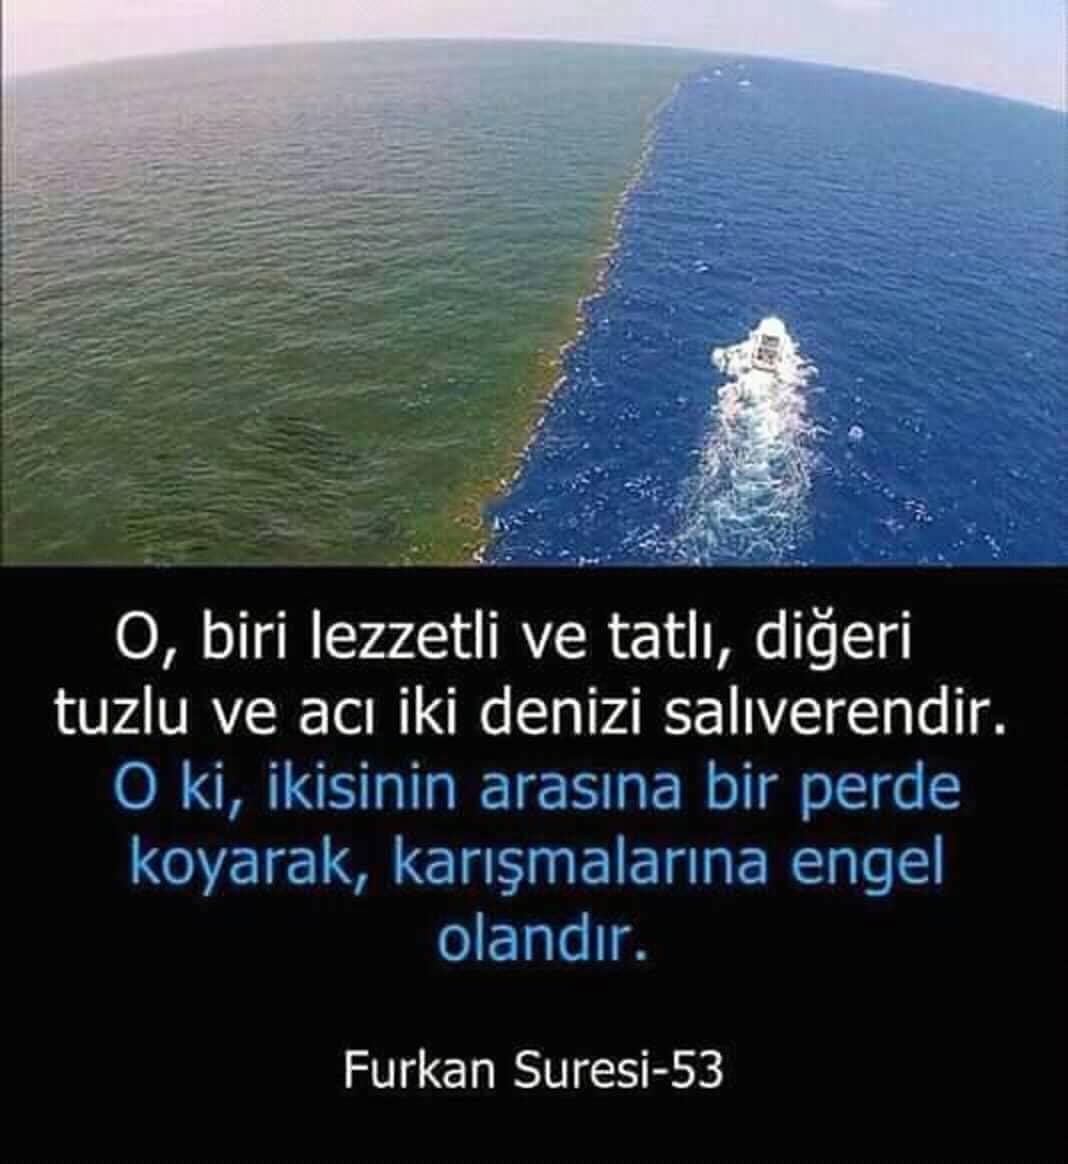 Furkan Suresi 53 | www.corek-otu-yagi.com